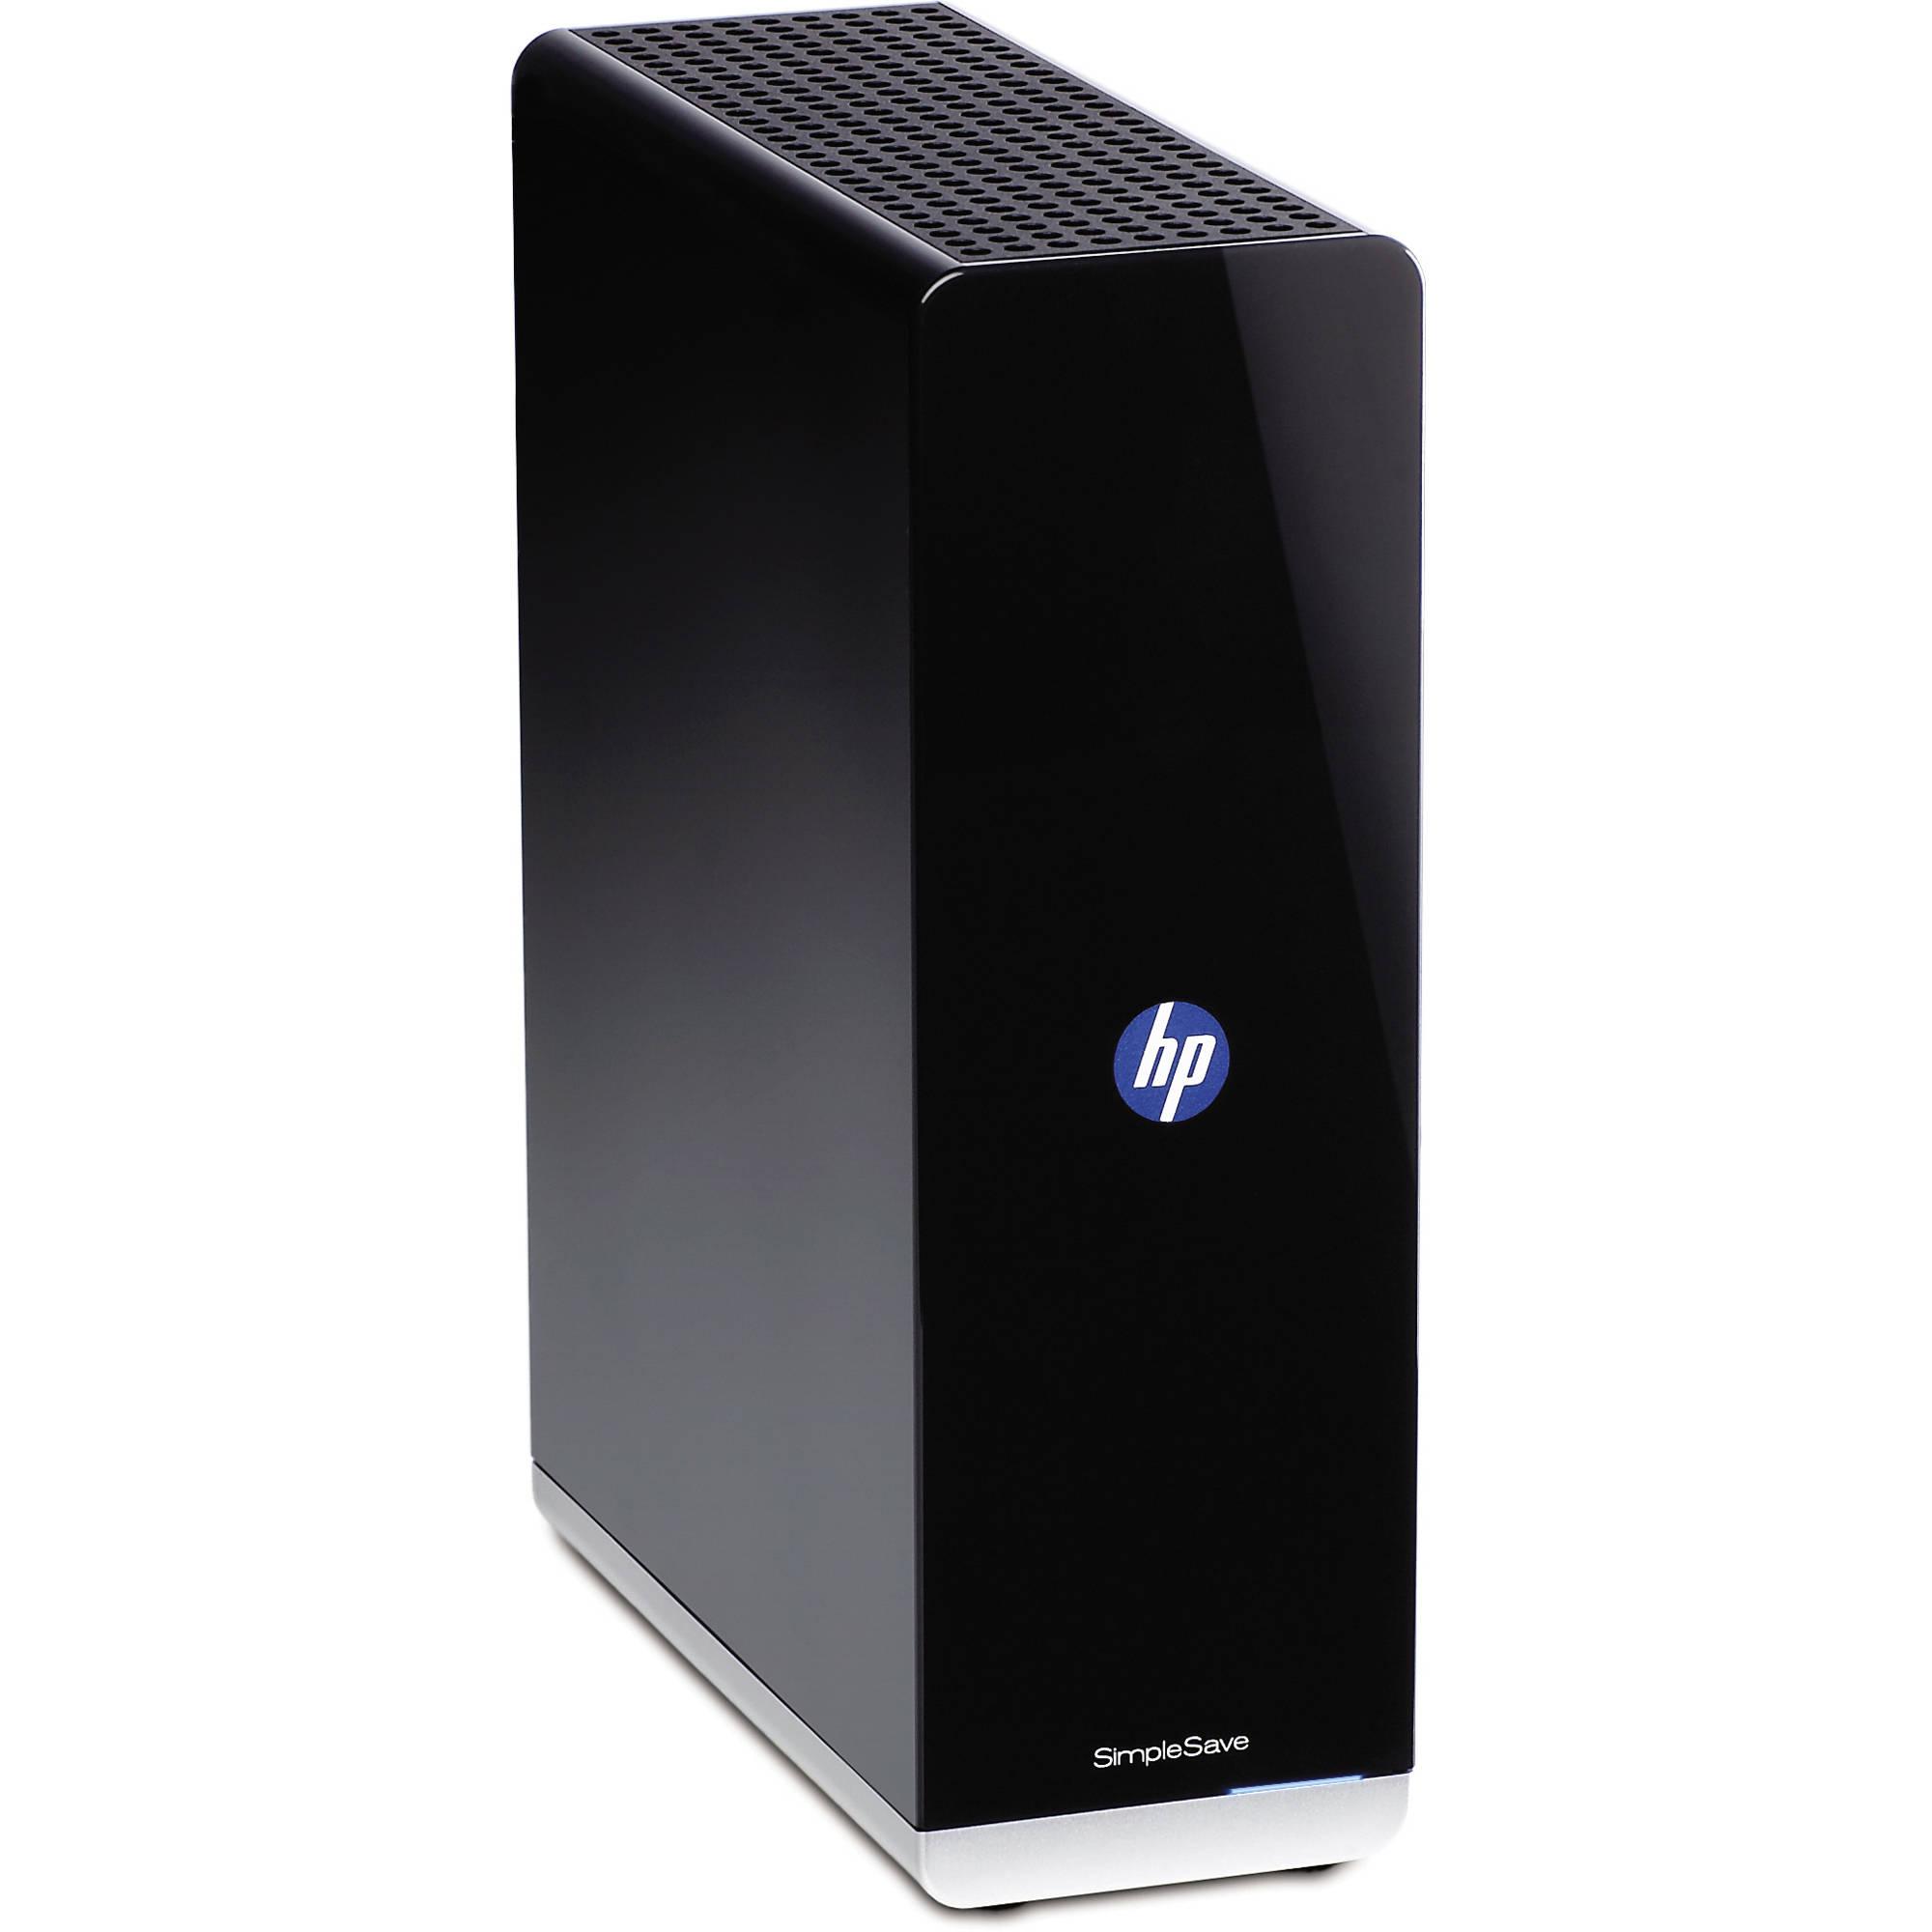 Hp 3tb simplesave external desktop usb 3 1 wdbw2a0030hbk nesn for 3tb esterno